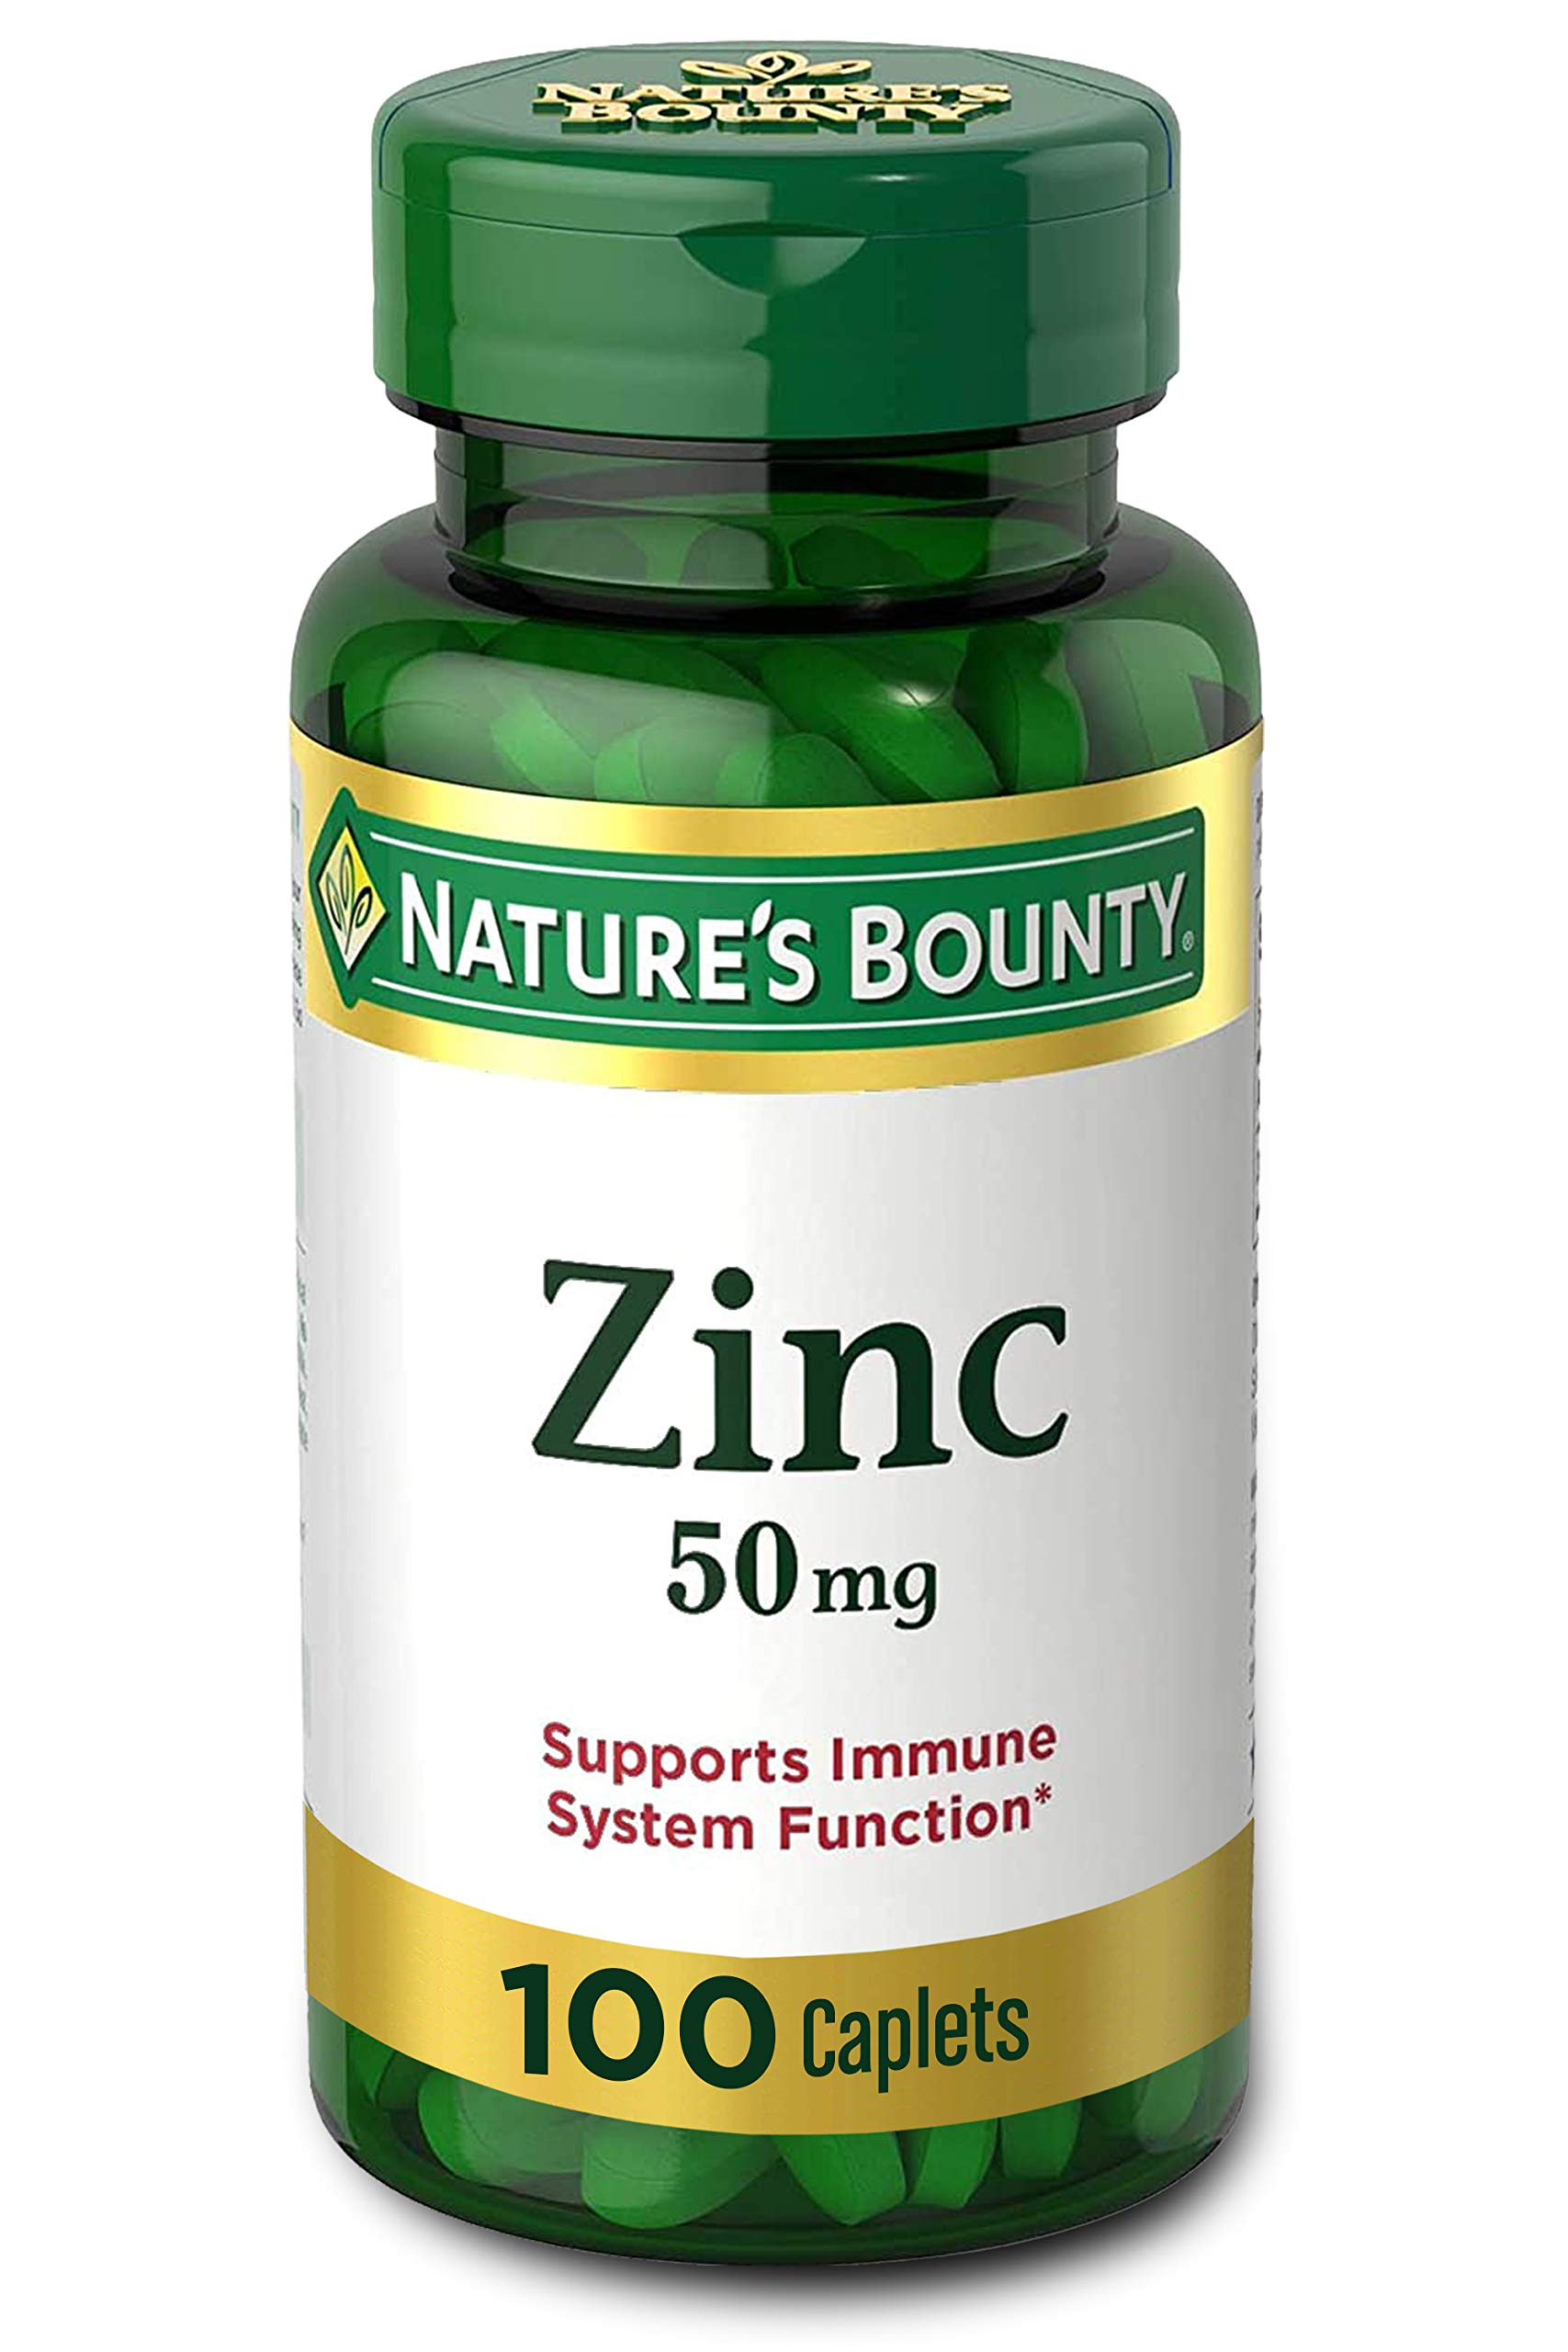 Nature's Bounty Zinc 50 mg Caplets 100 ct